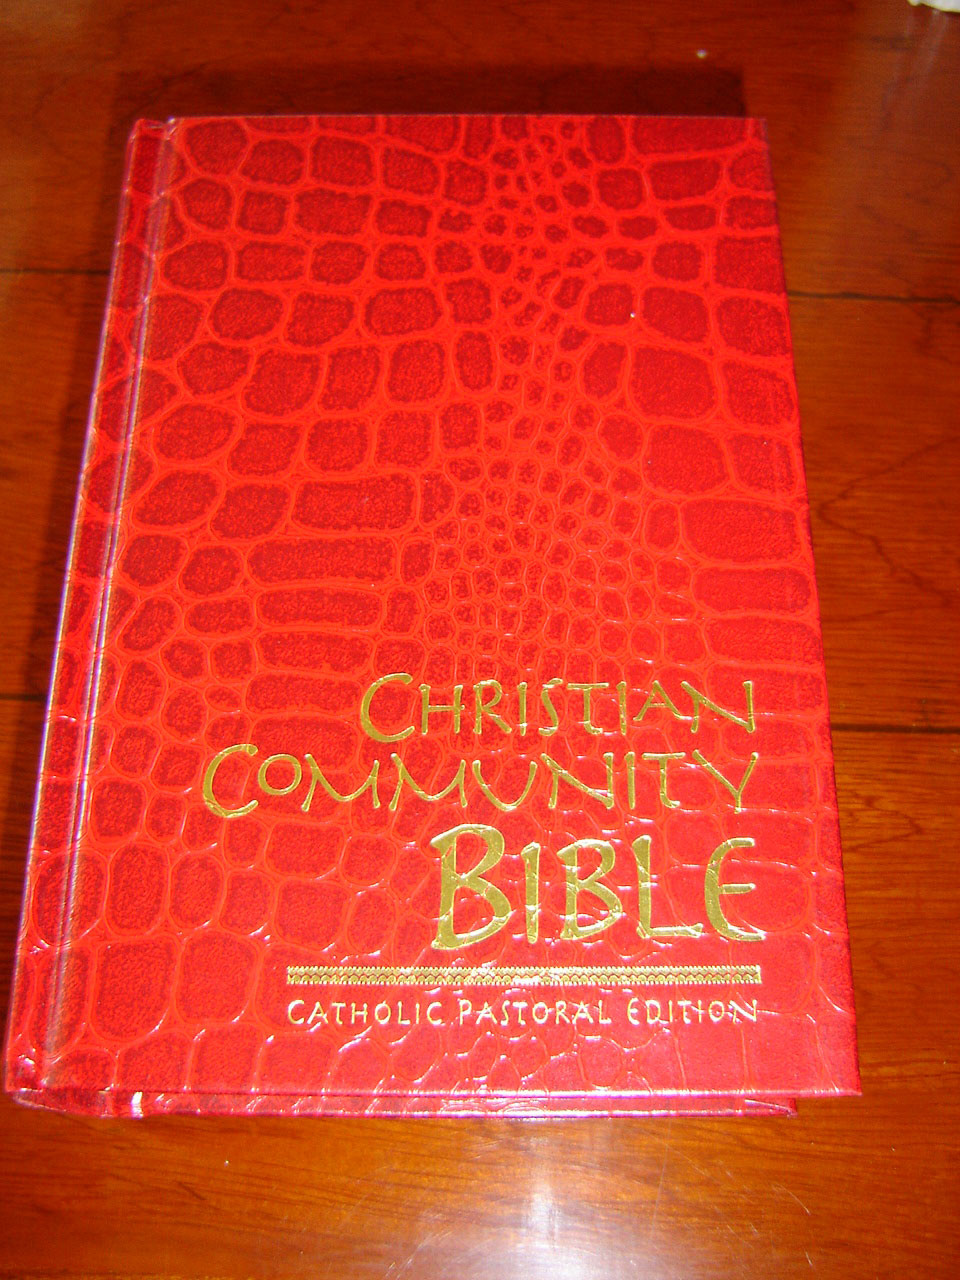 Christian Community Bible RED / Catholic Pastoral Edition Claretian 52  Edition